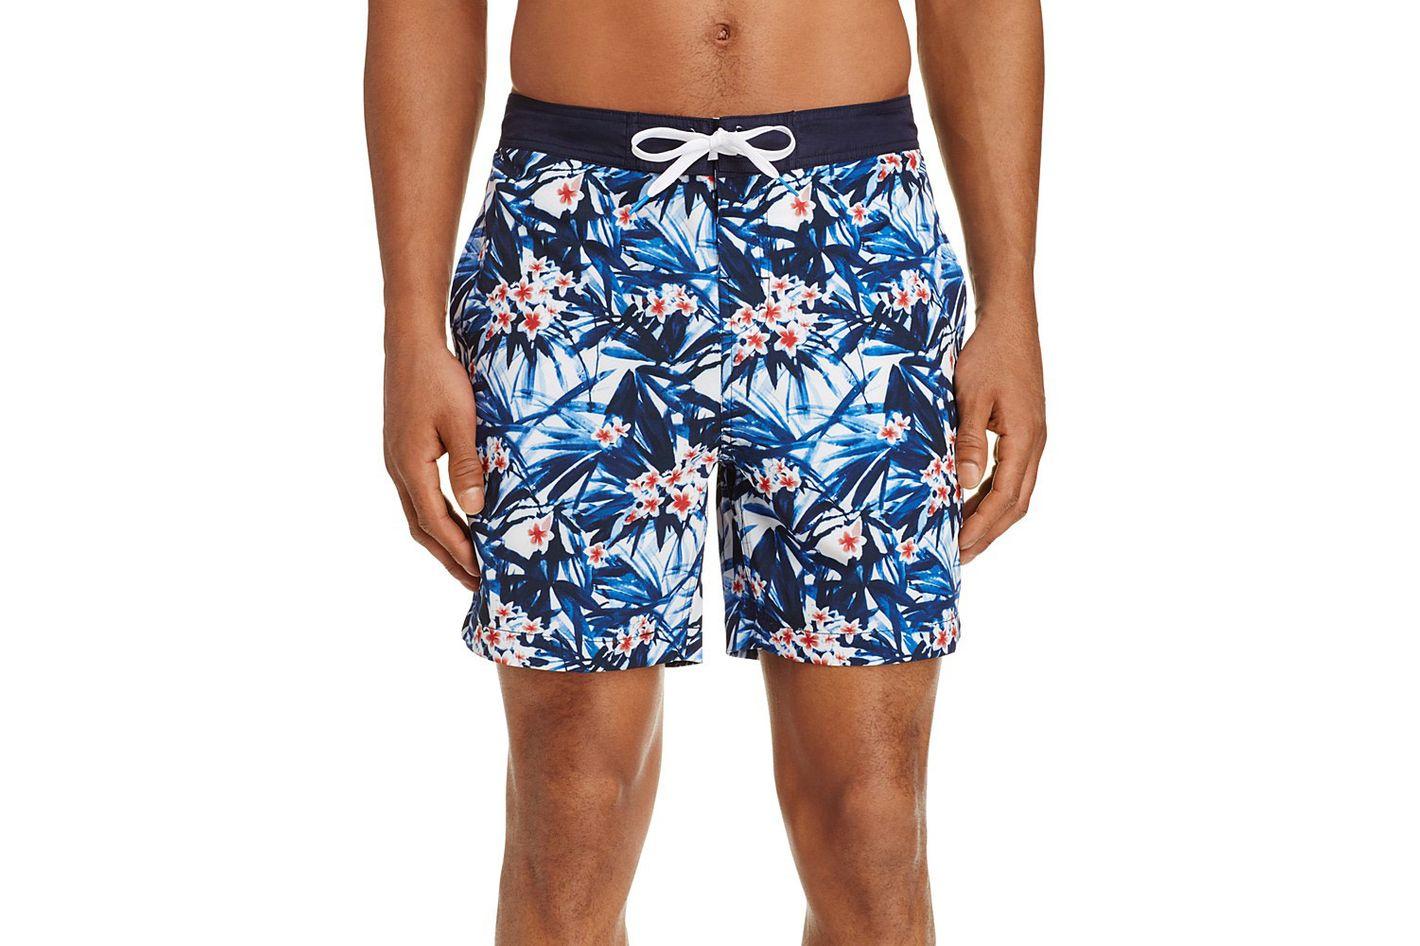 Michael Bastian Gray Label Floral Swim Shorts